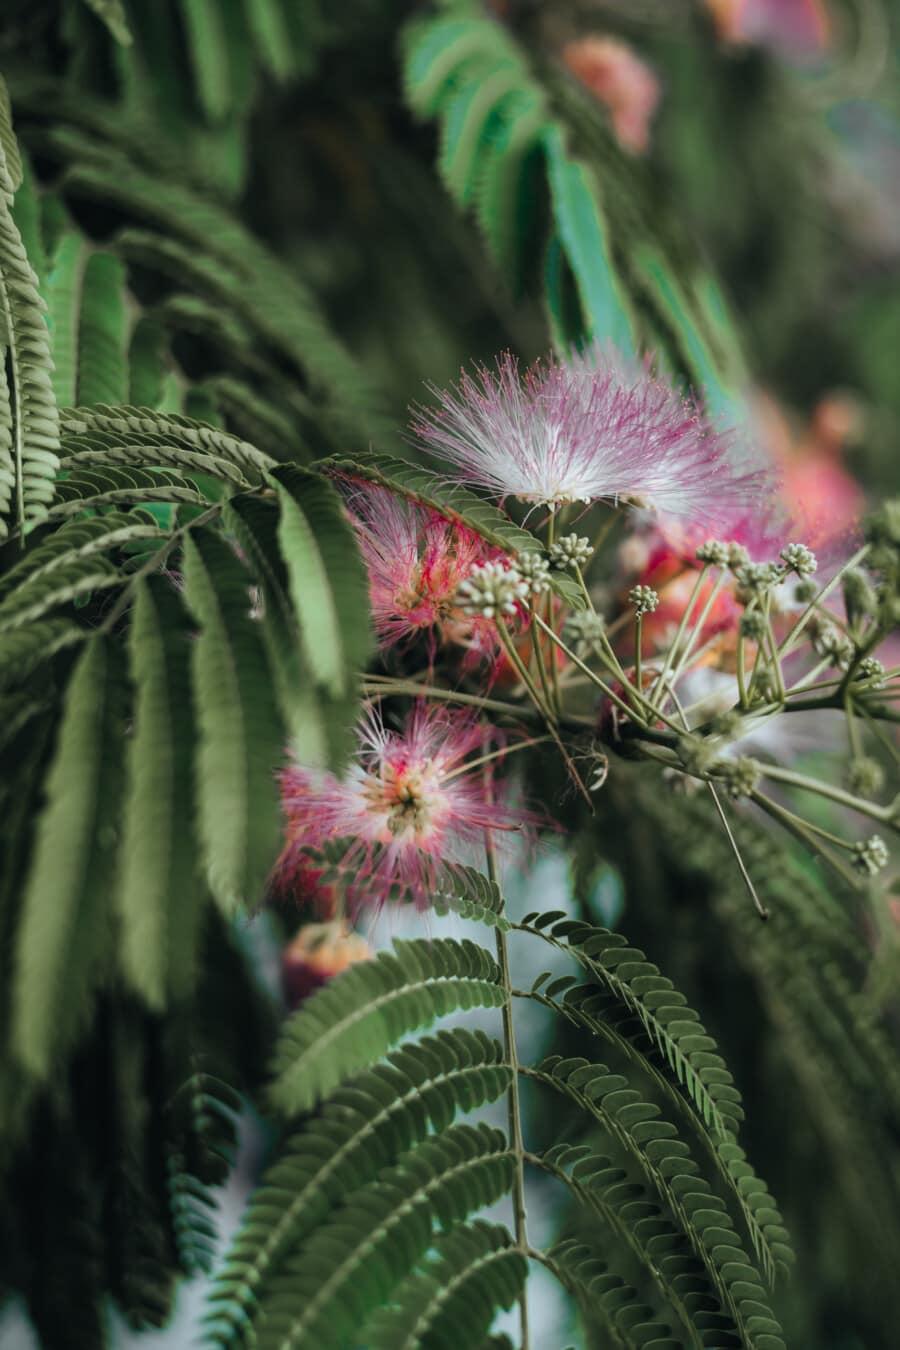 tree, branchlet, flowers, beautiful, tropical, herb, exotic, leaf, shrub, plant